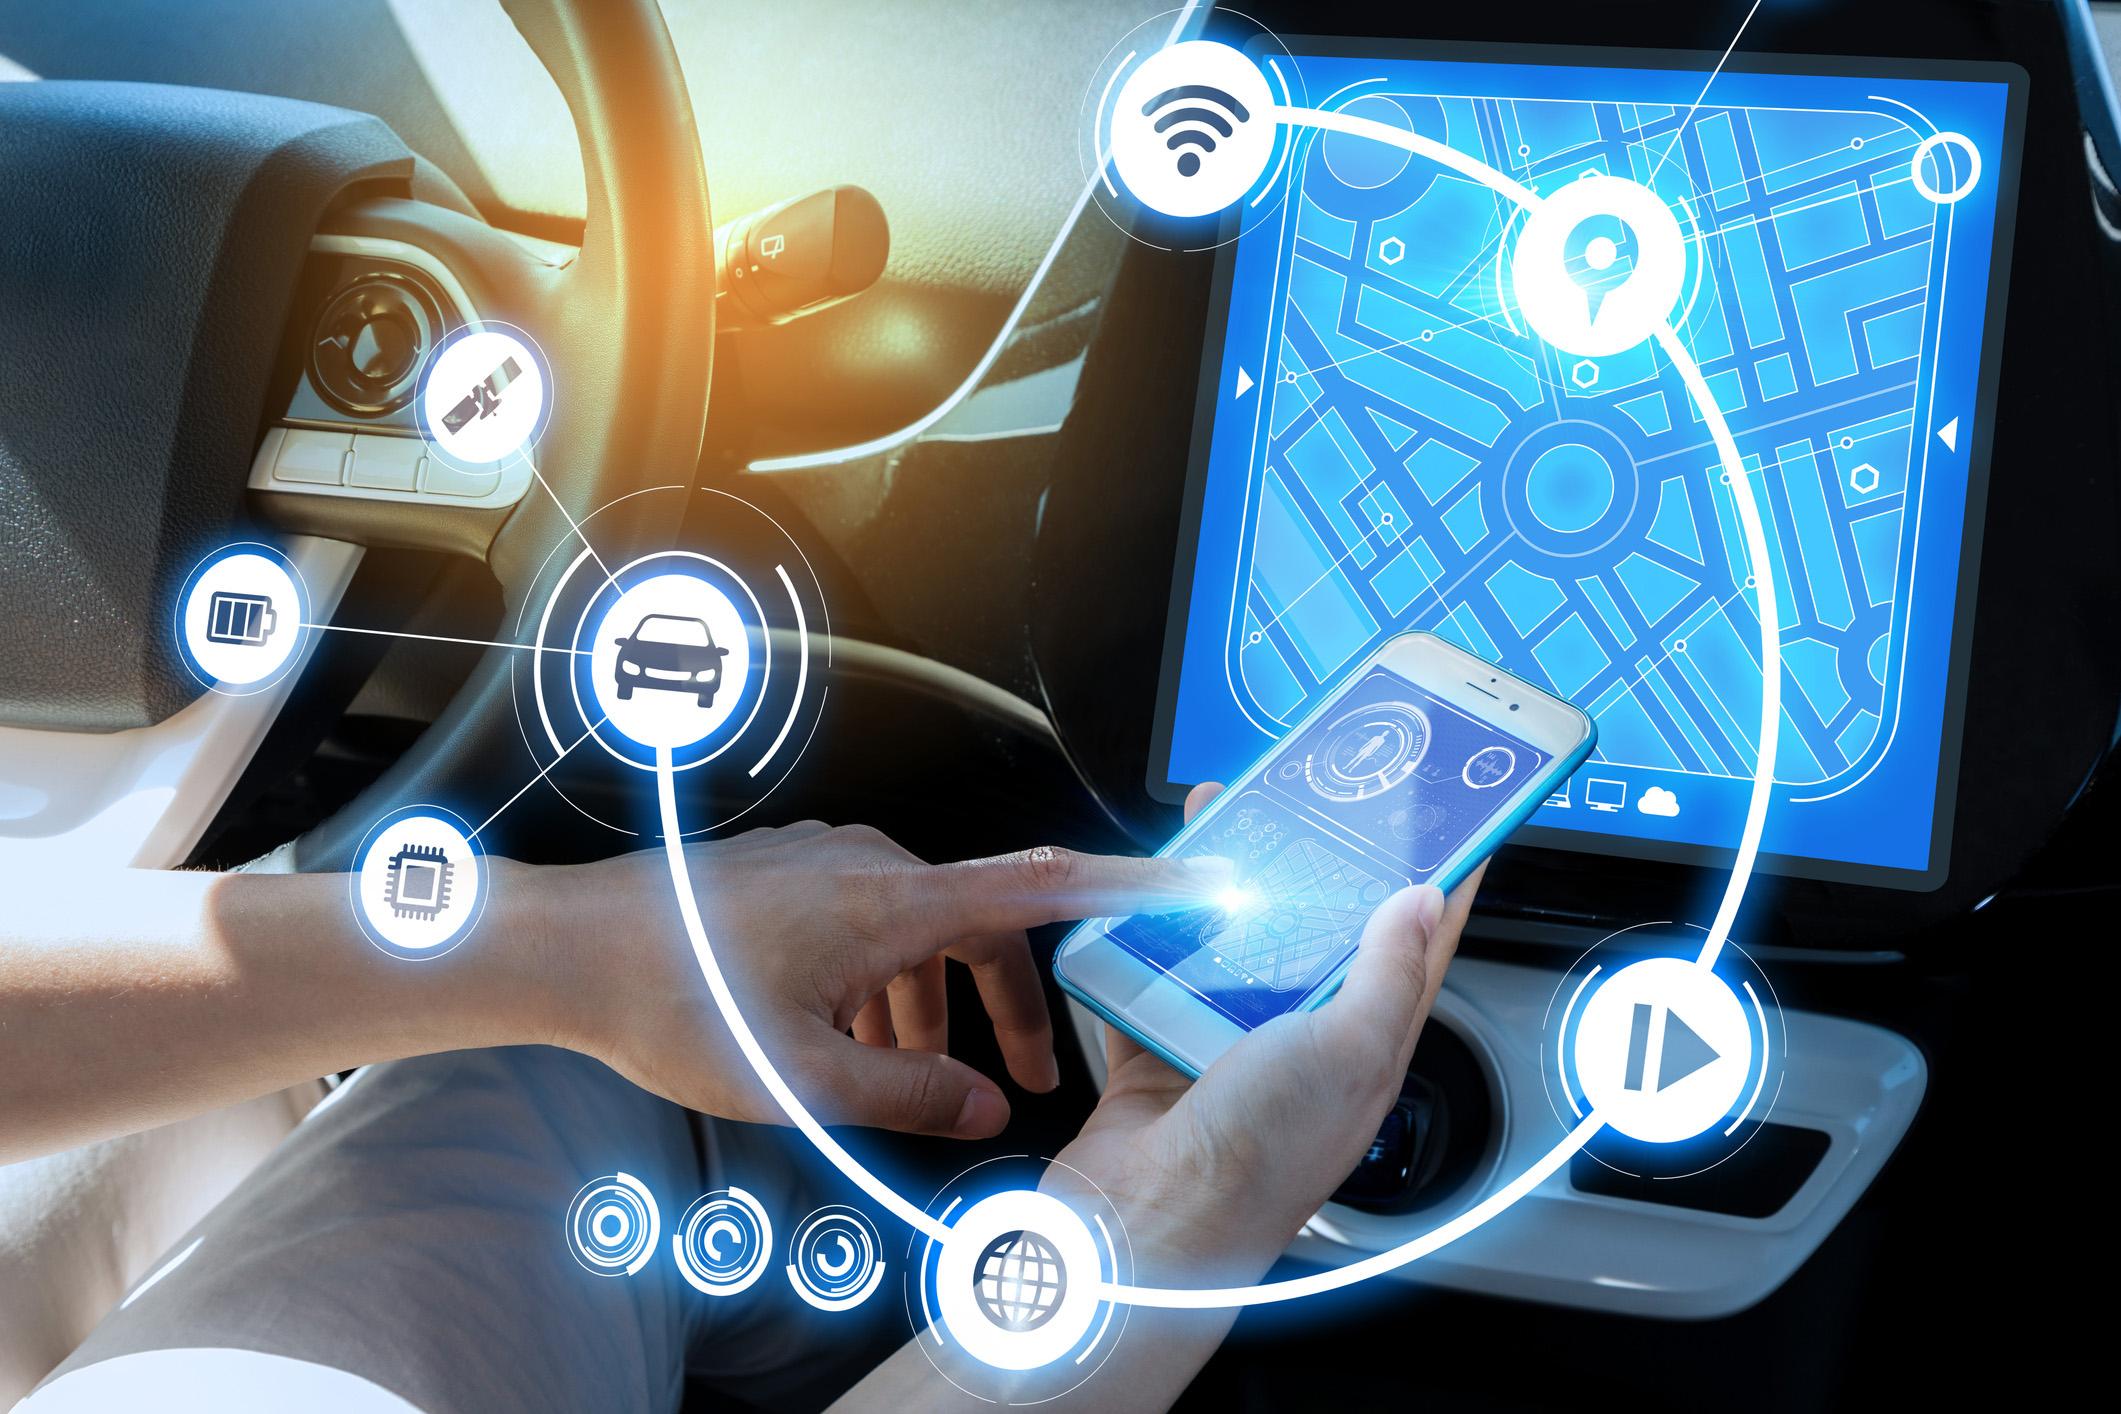 vehicle surveillance system in Doha Qatar